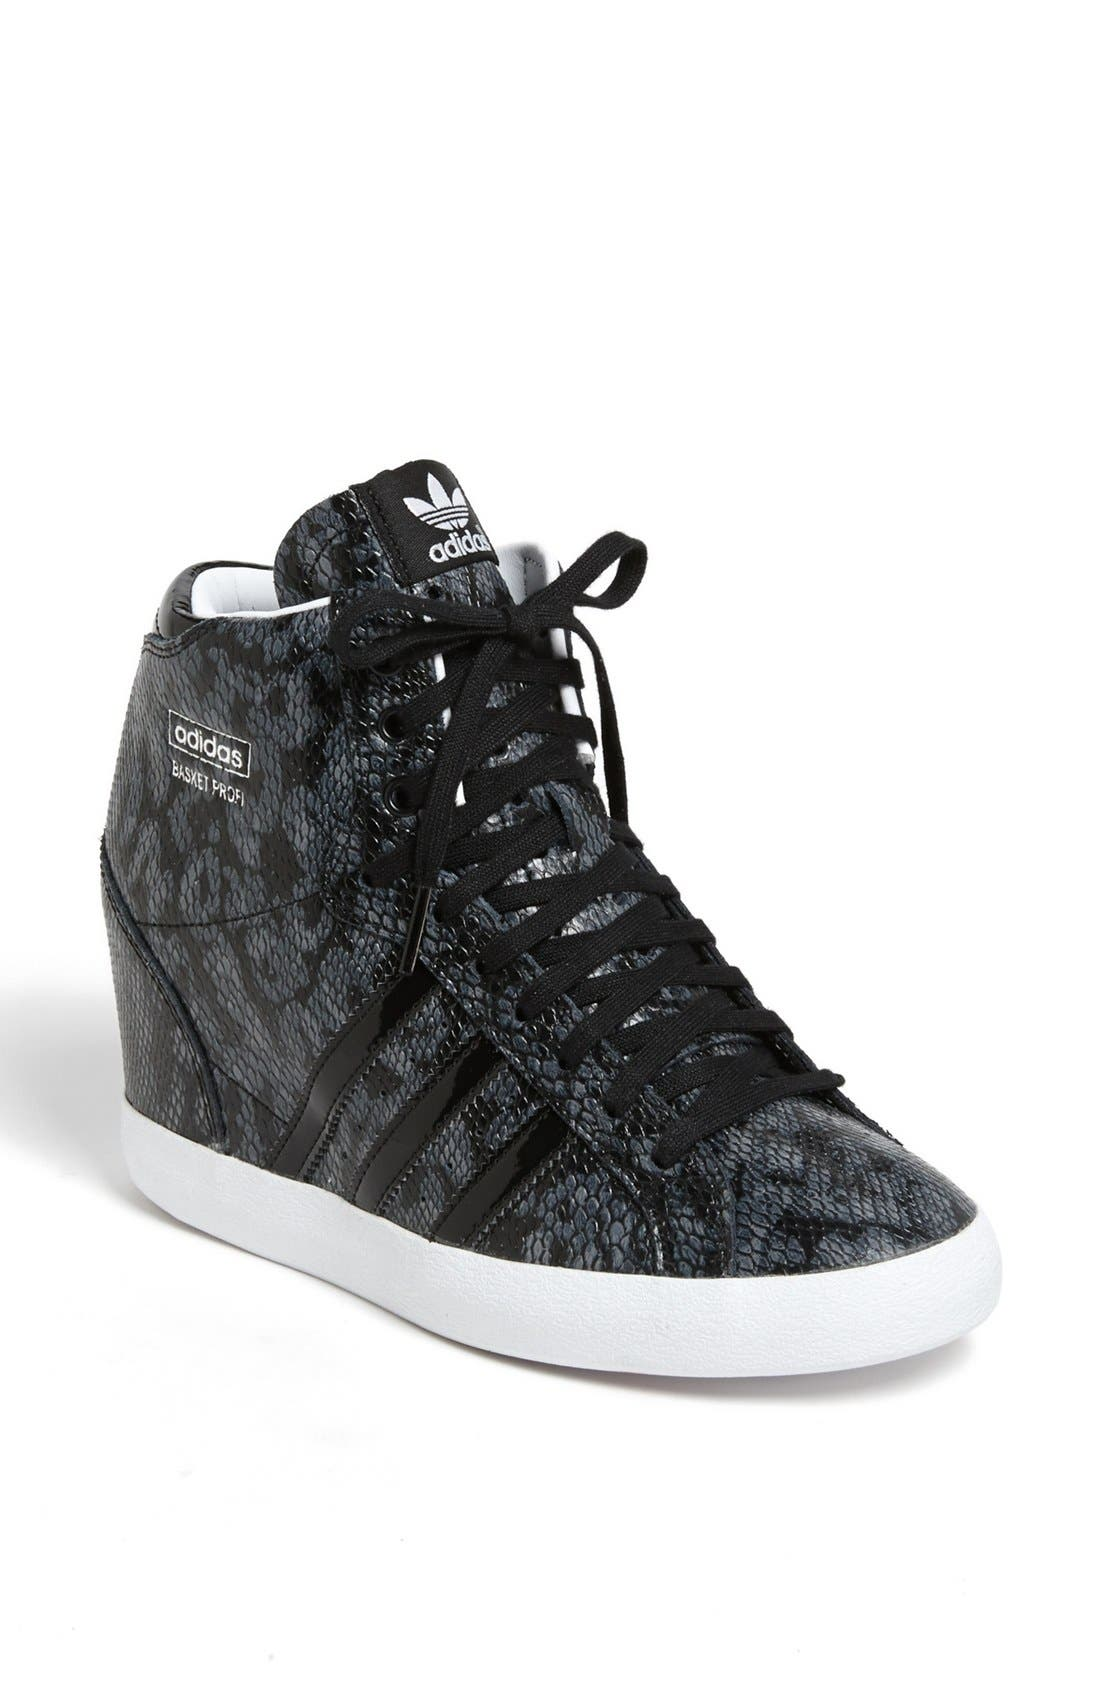 ADIDAS, 'Basket Profi' Hidden Wedge Sneaker, Main thumbnail 1, color, 001